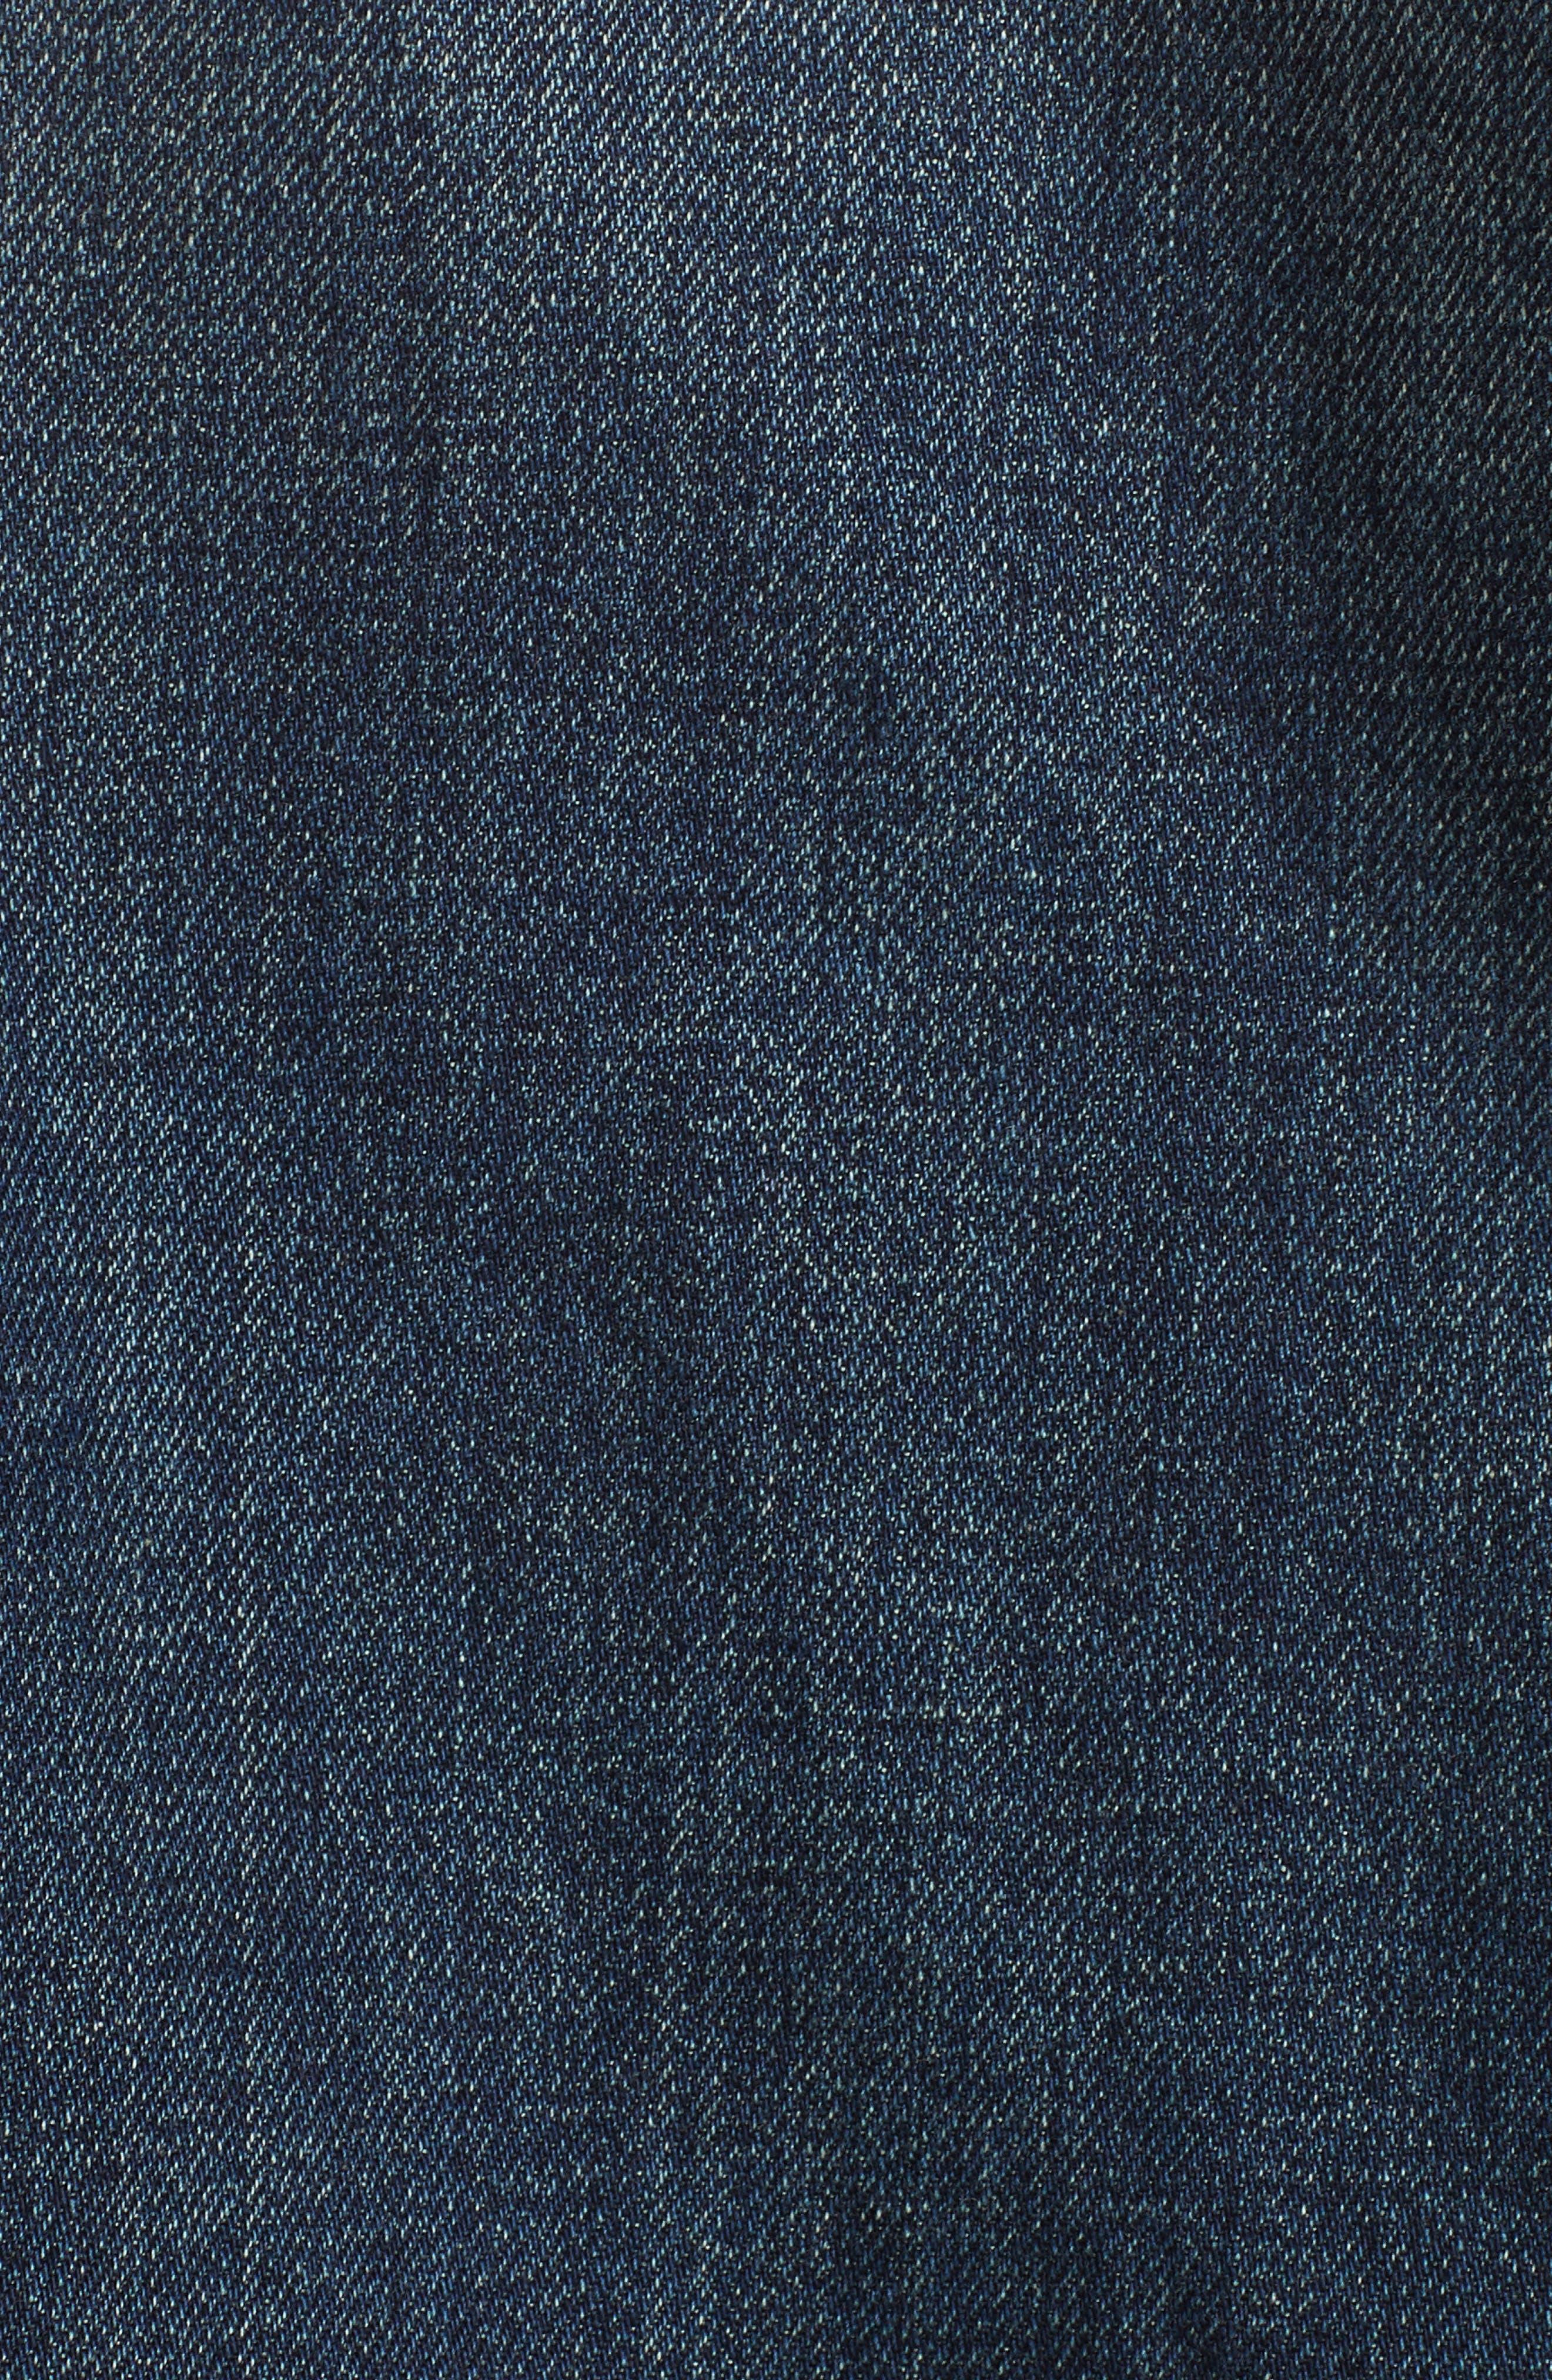 Denim Jacket,                             Alternate thumbnail 6, color,                             DARK INDIGO